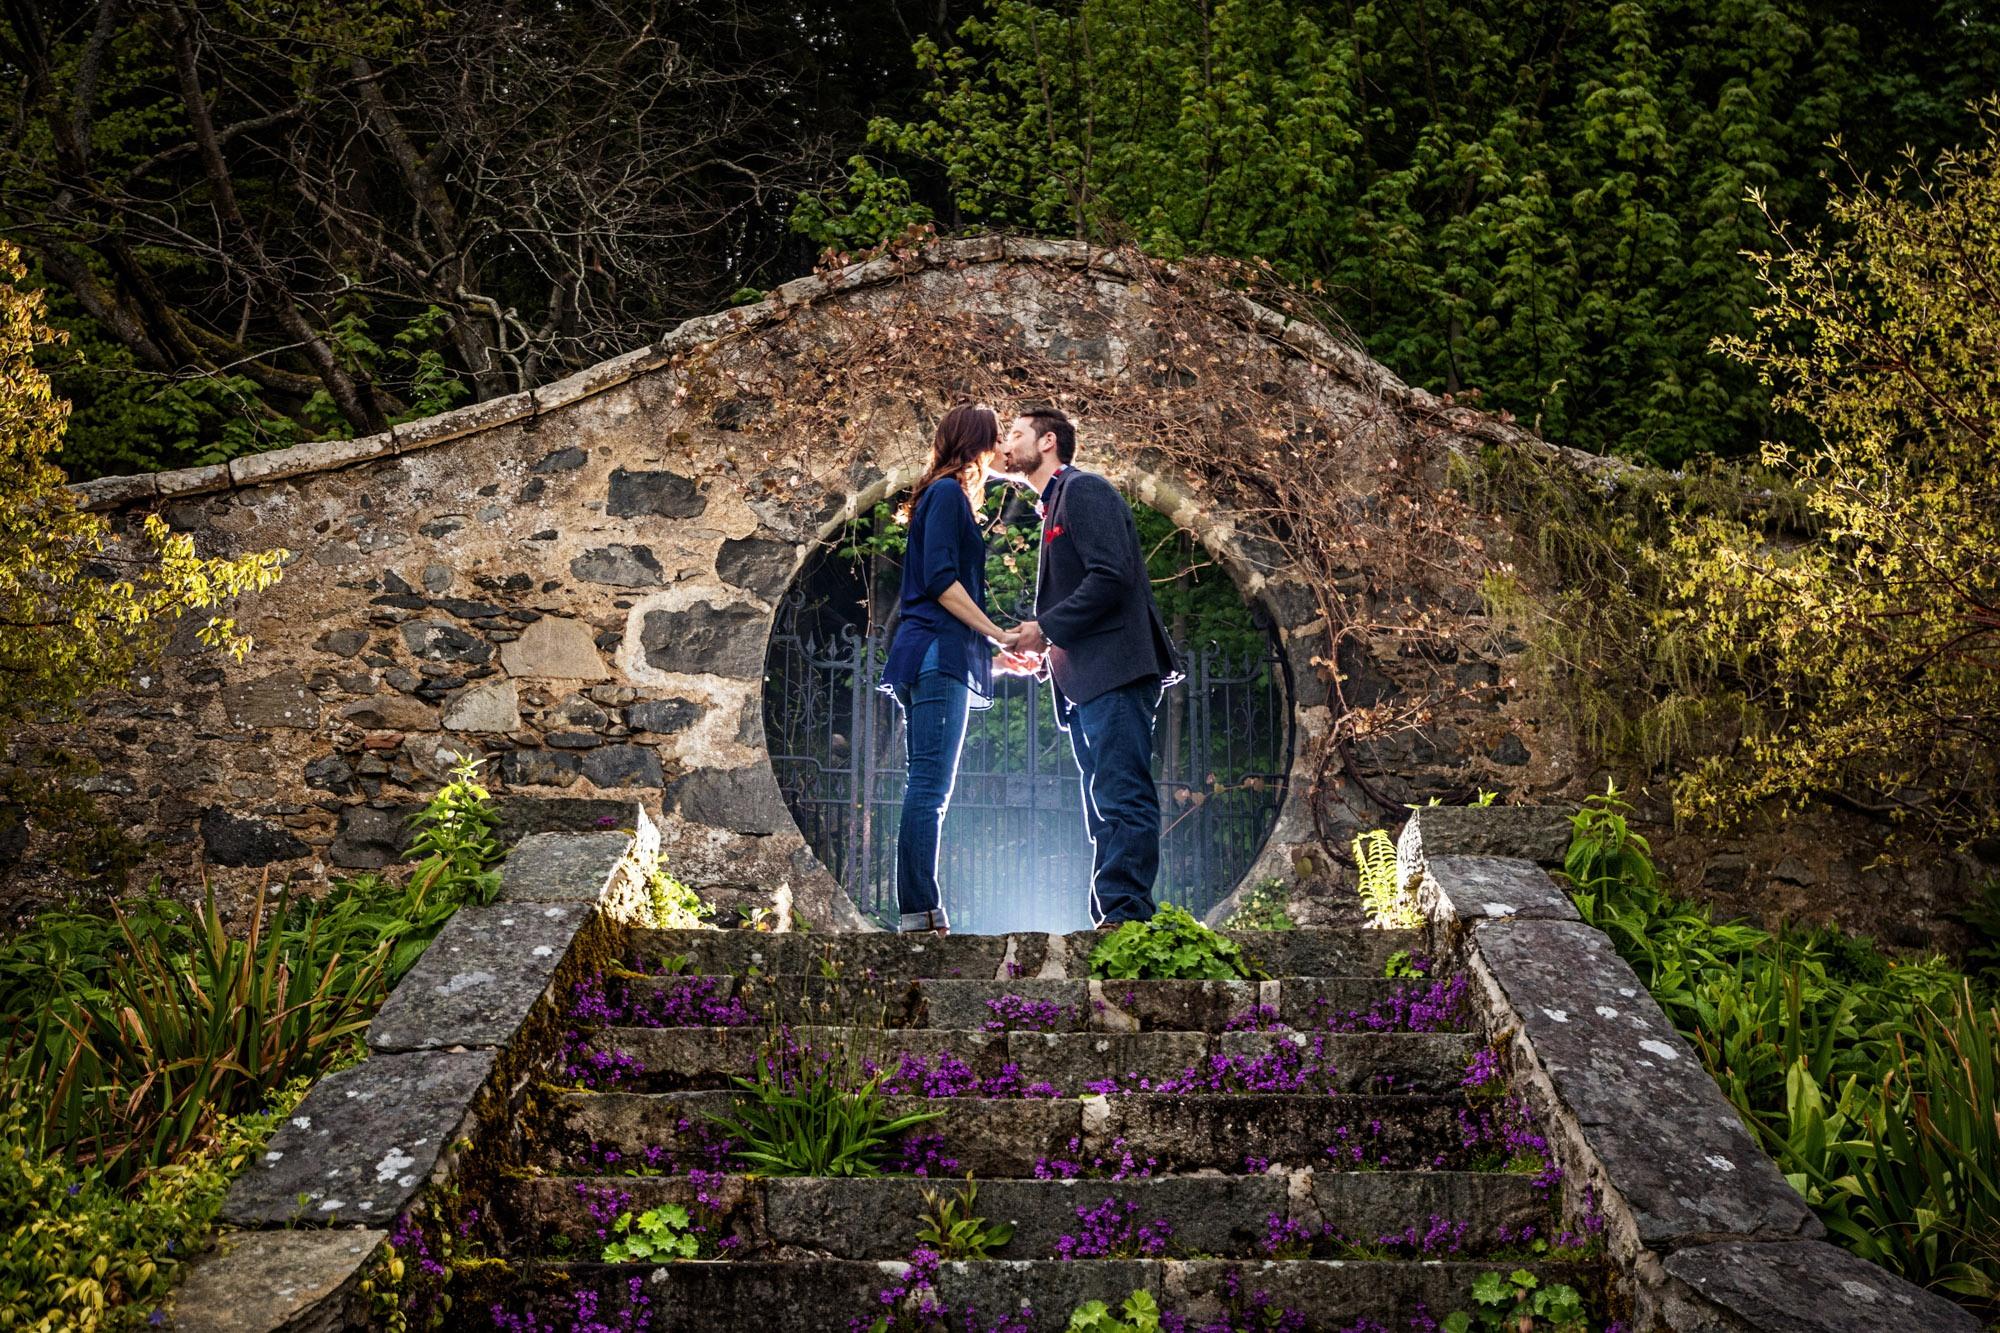 A pre wedding photograph taken at a wedding in Aberdeen by Jonathan Addie, an Aberdeen based wedding photographer